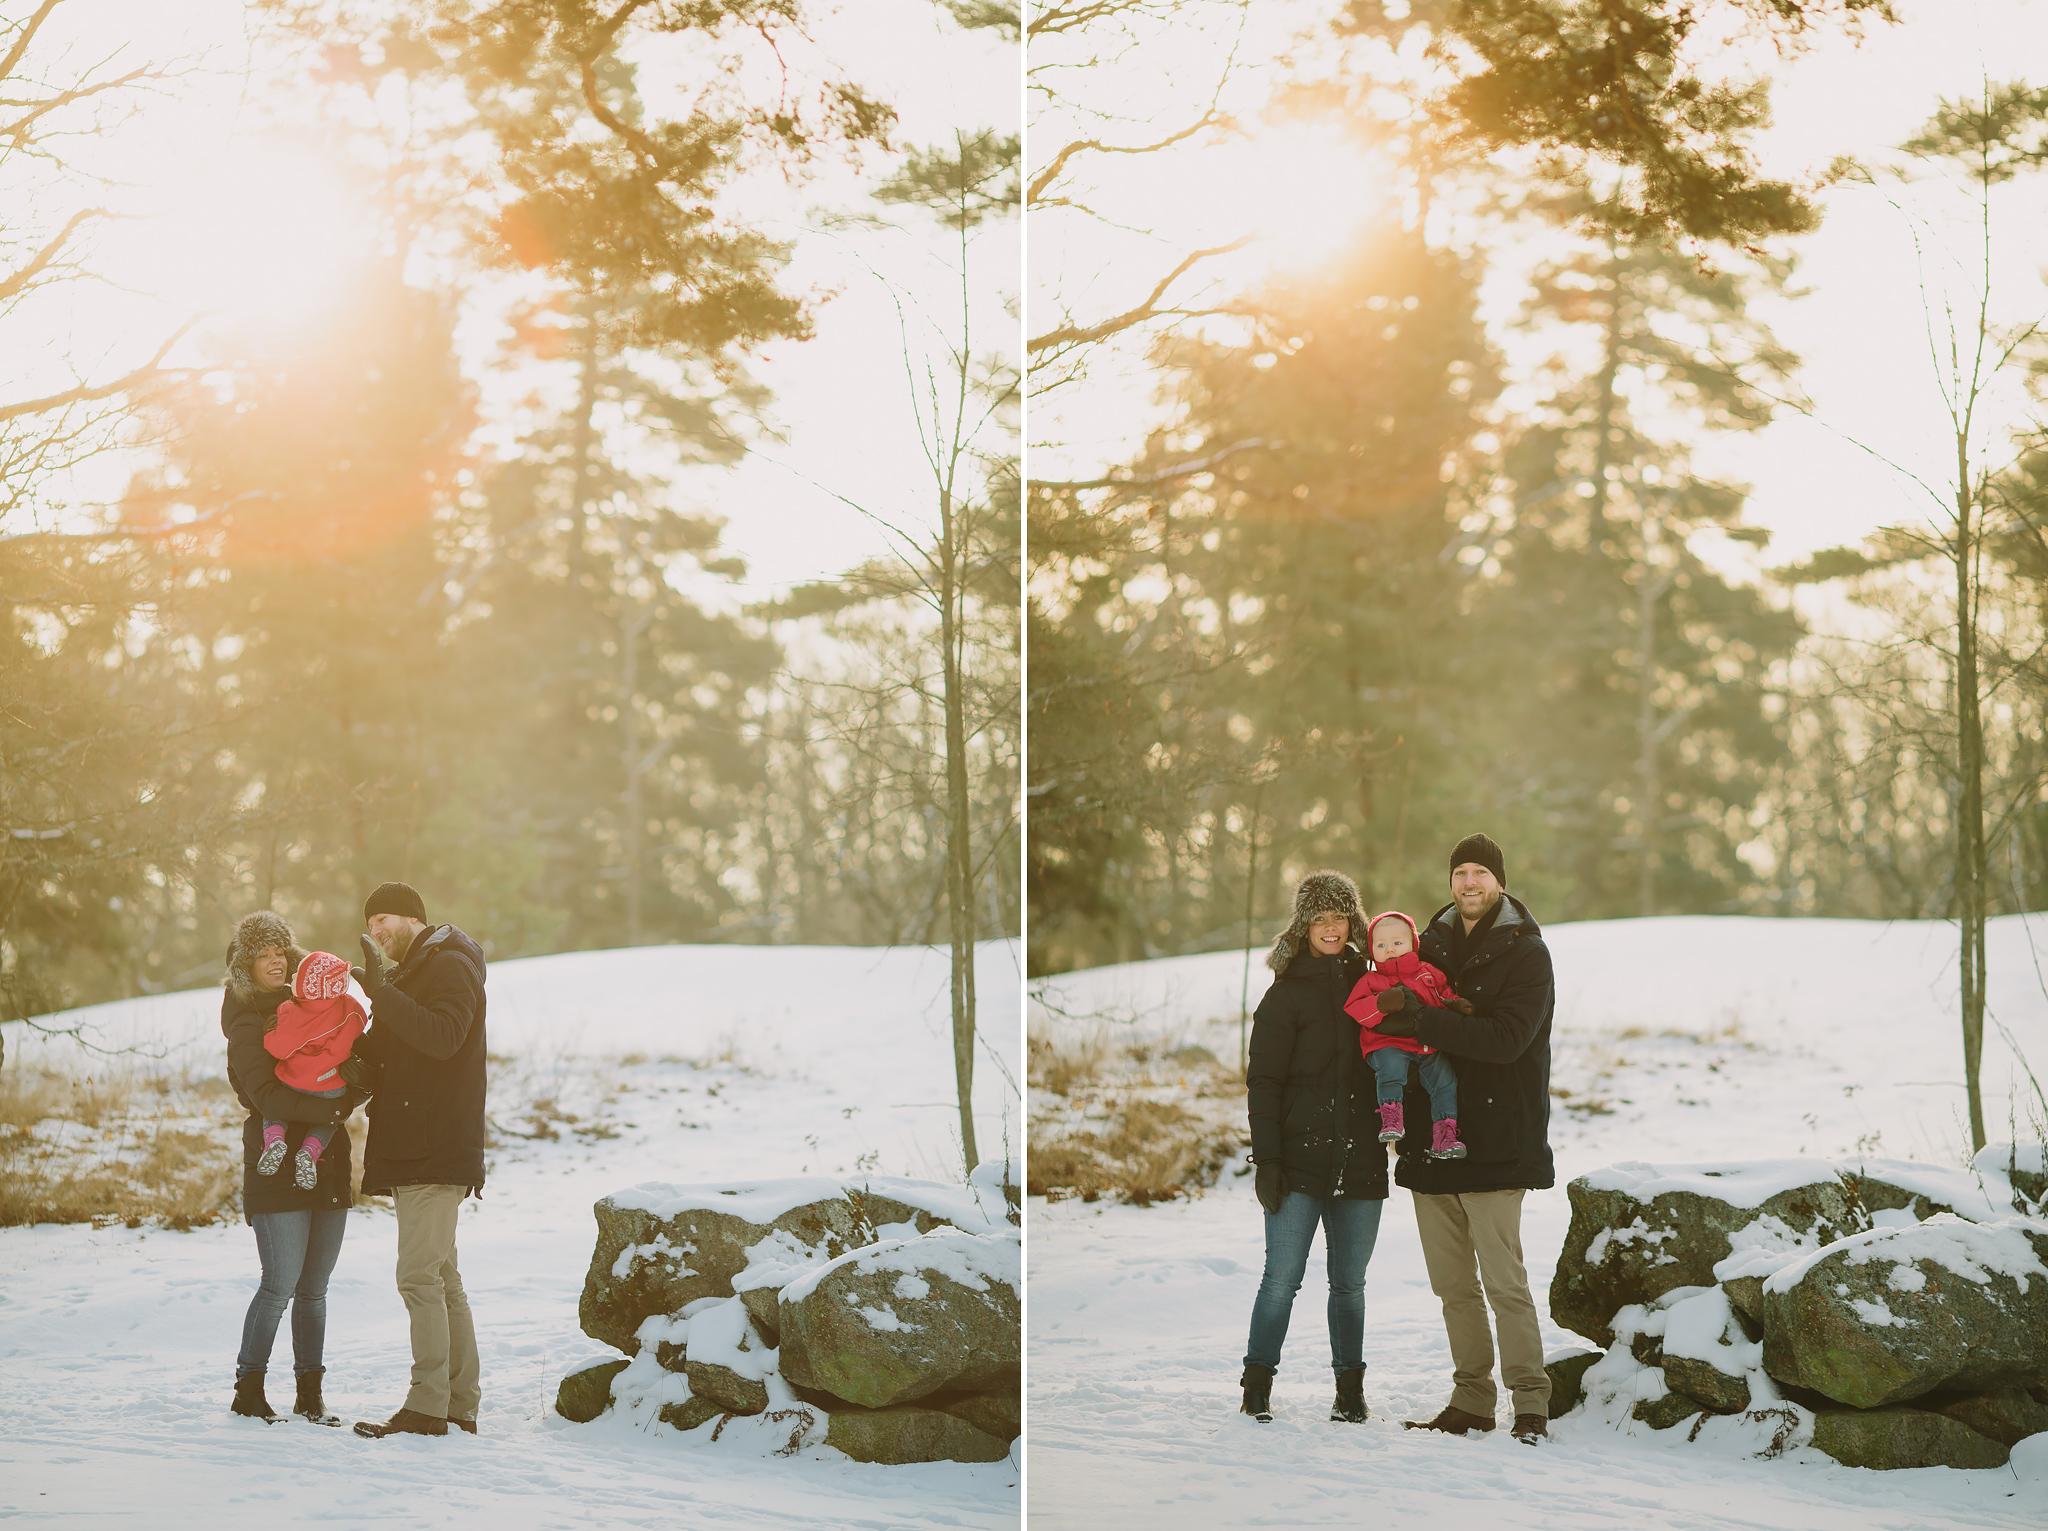 Familjefotograf Djäkneberget